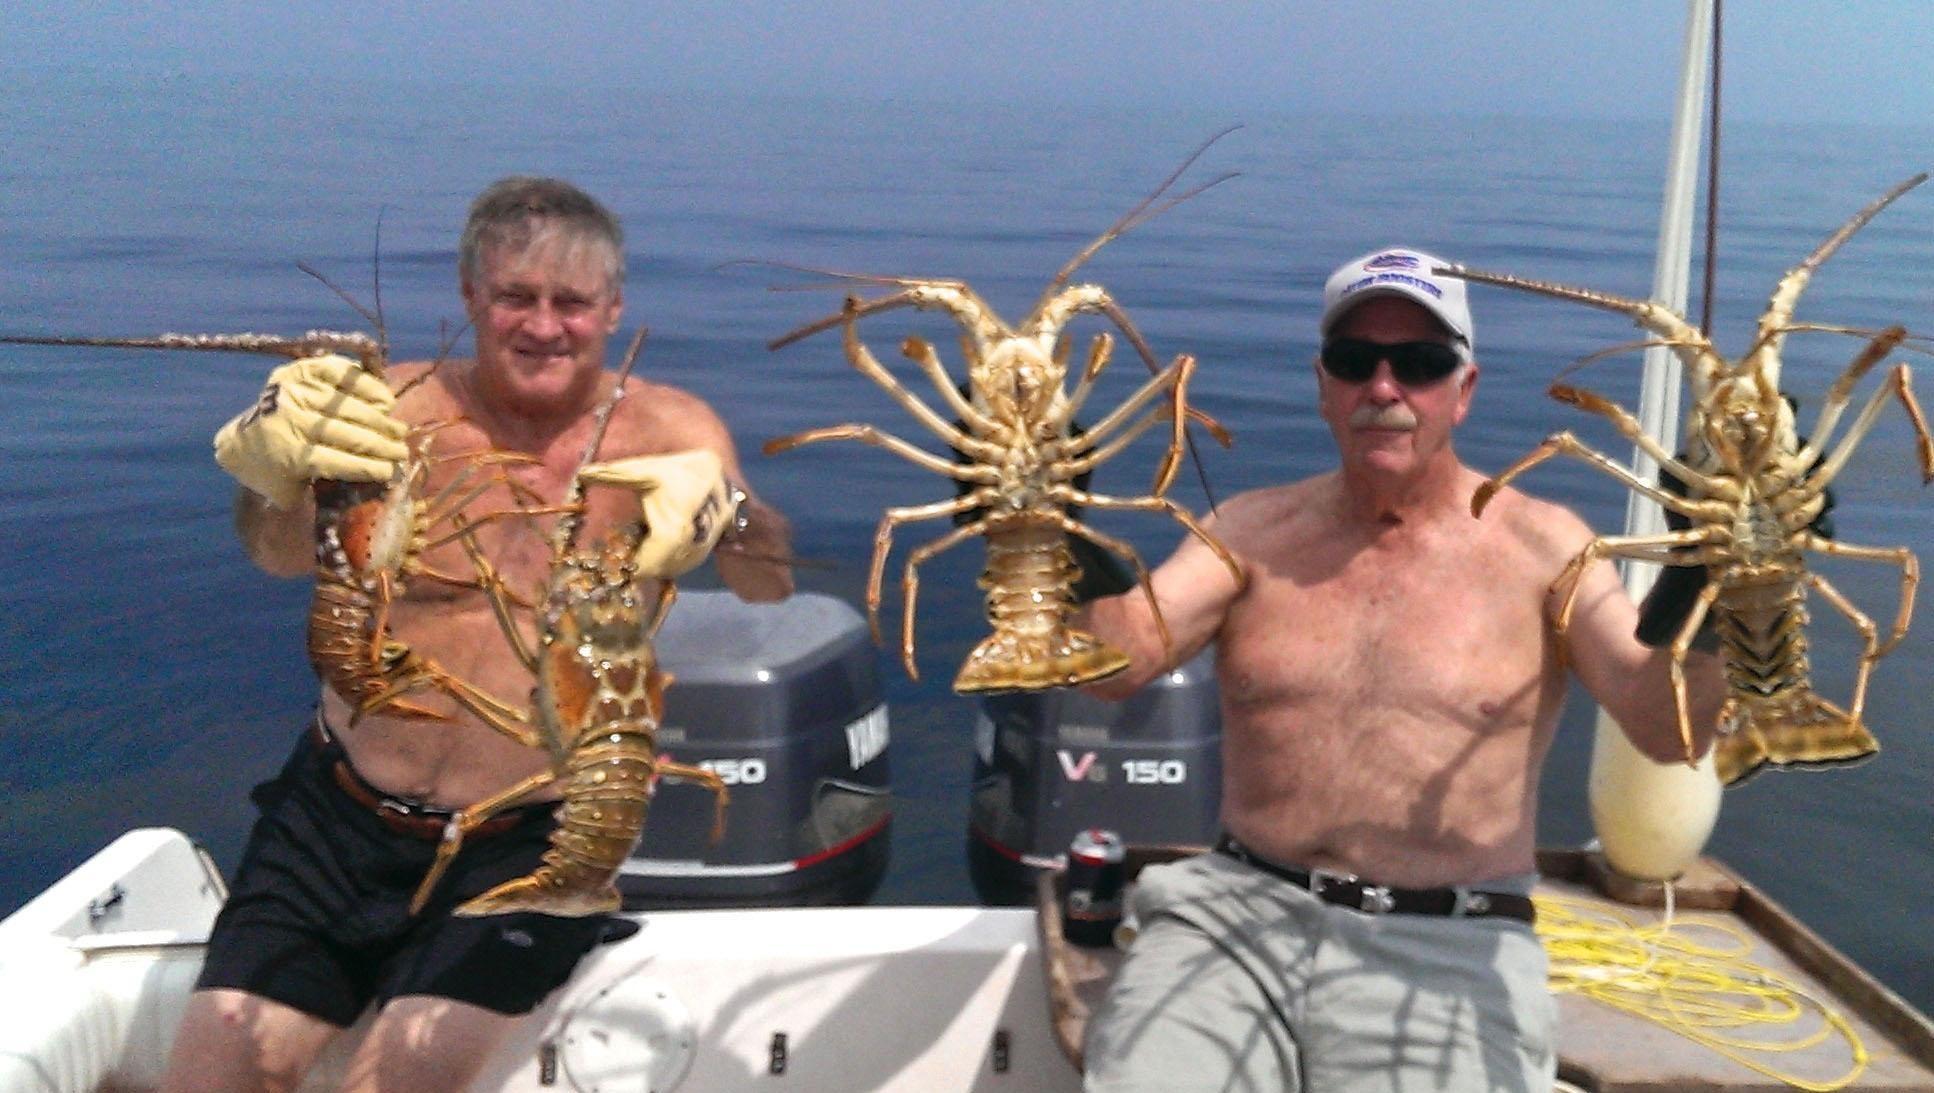 boats mean it's spiny lobster season